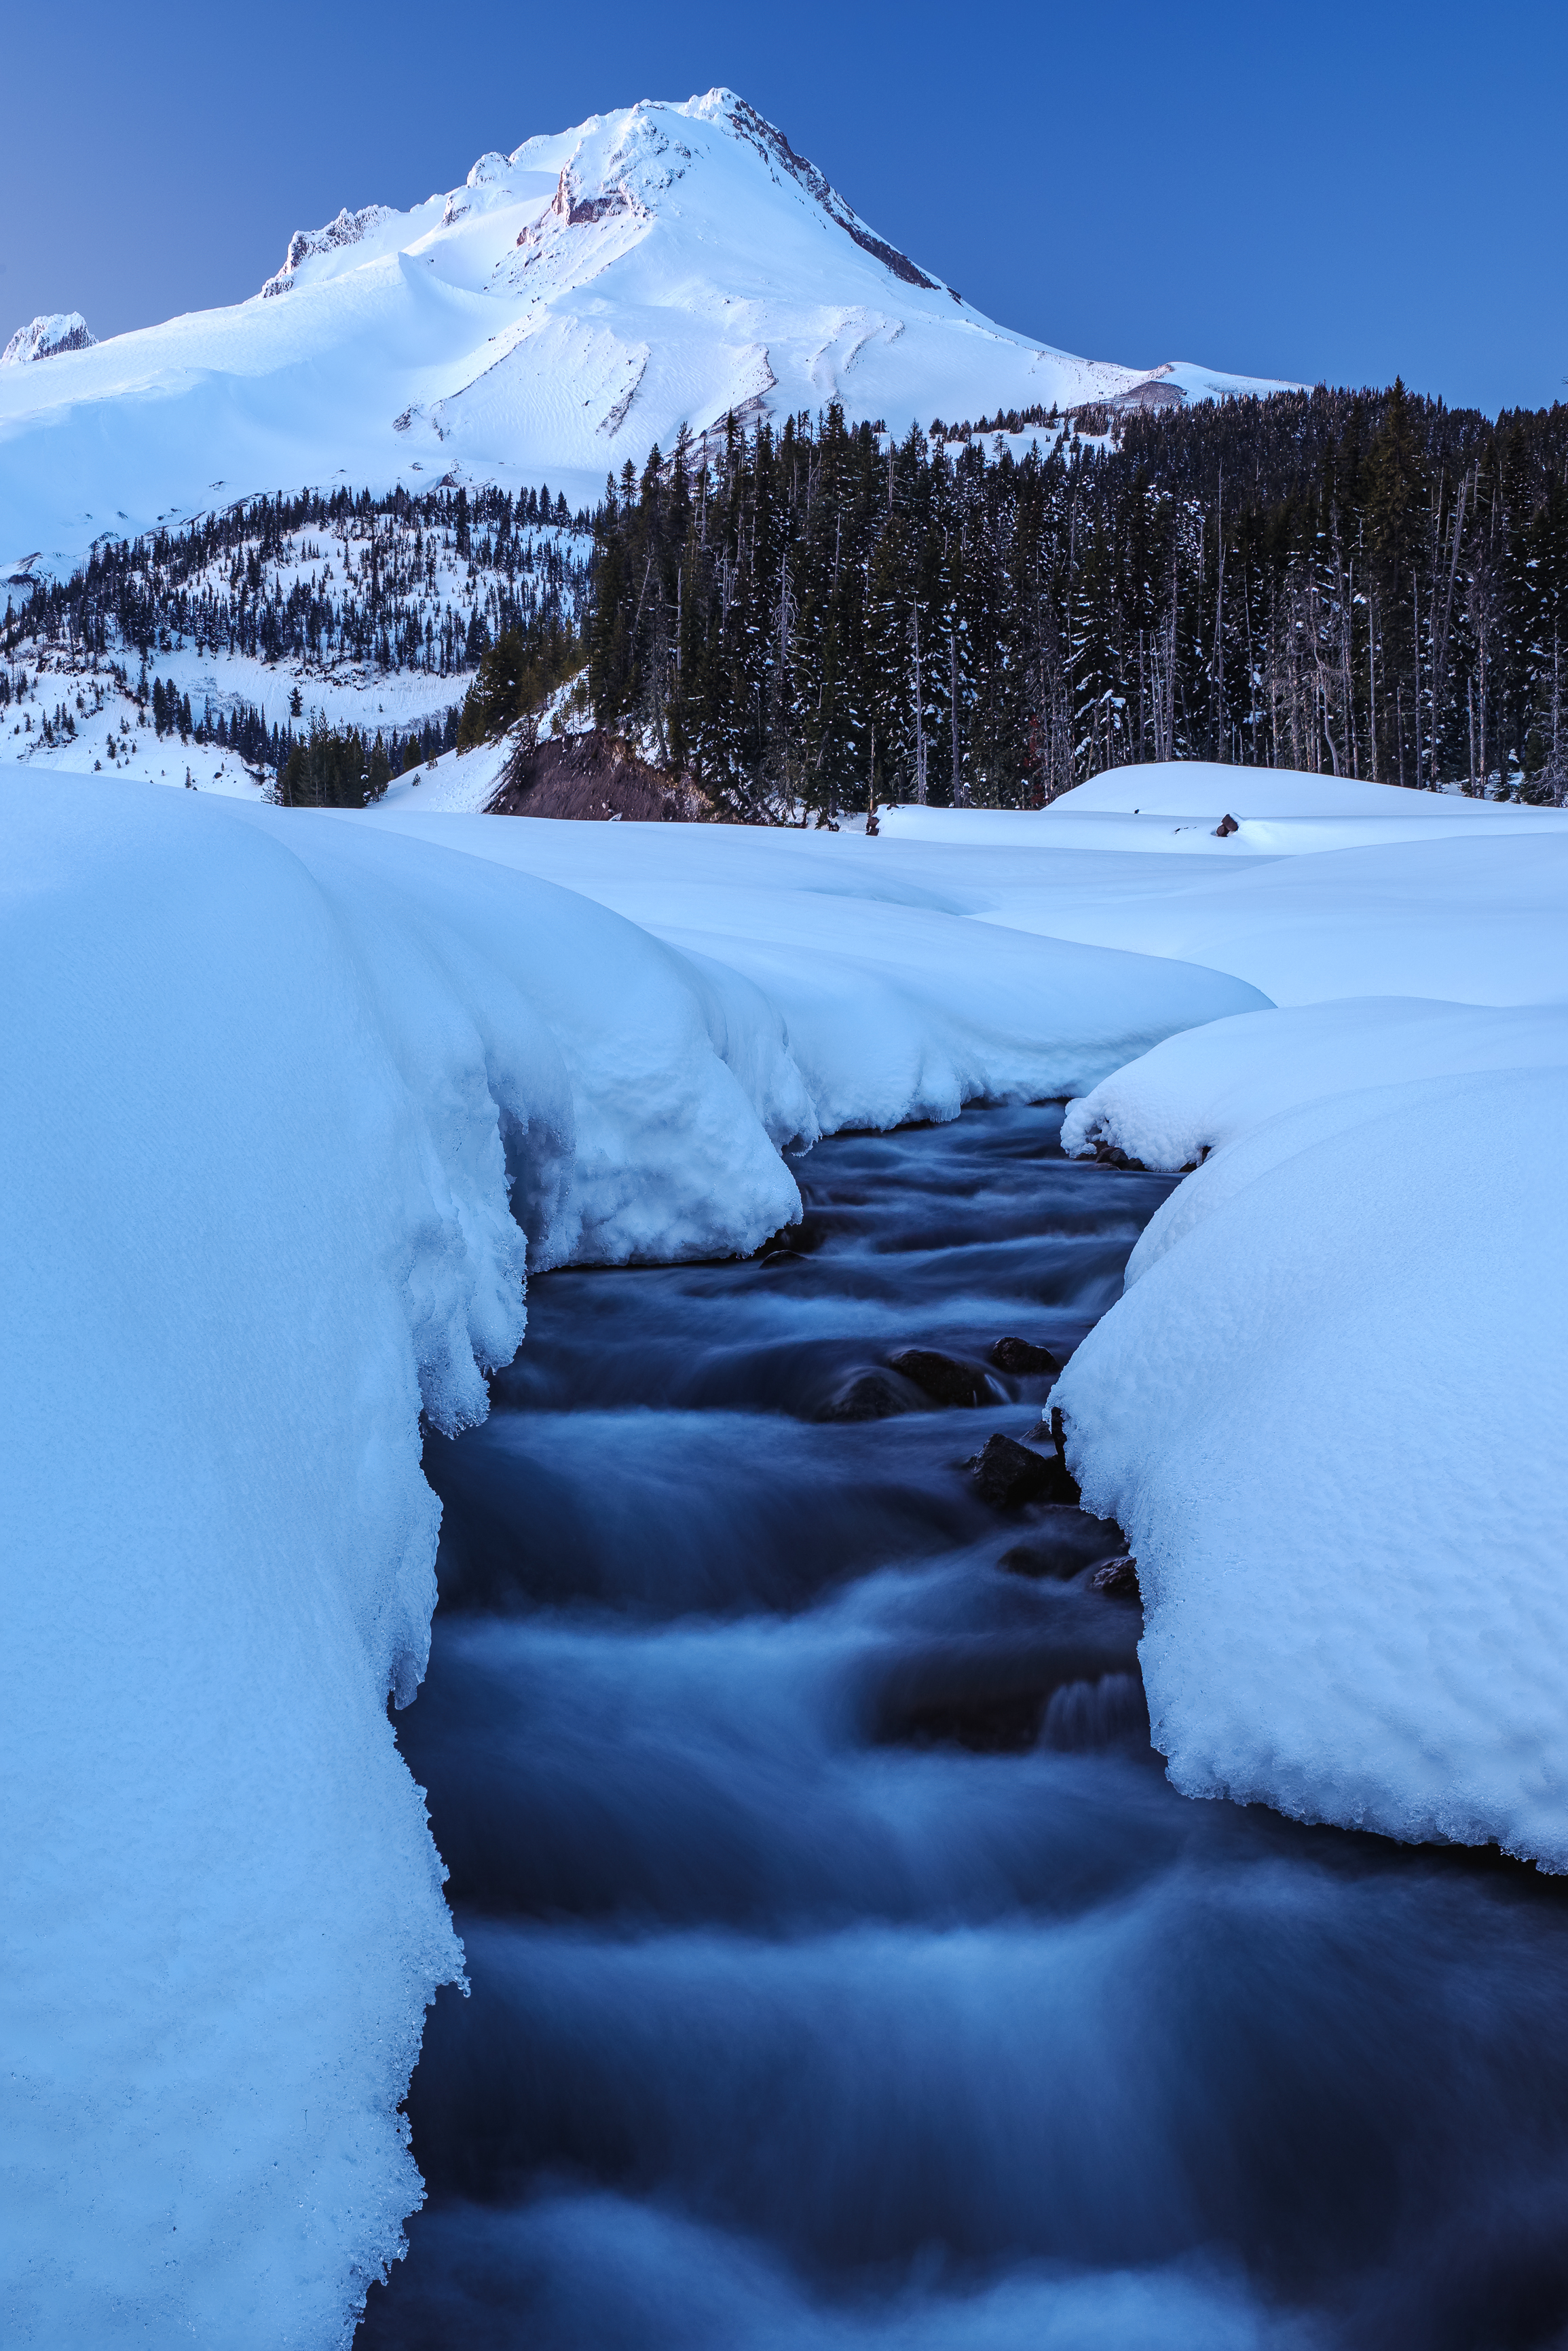 Mount Hood in Snow